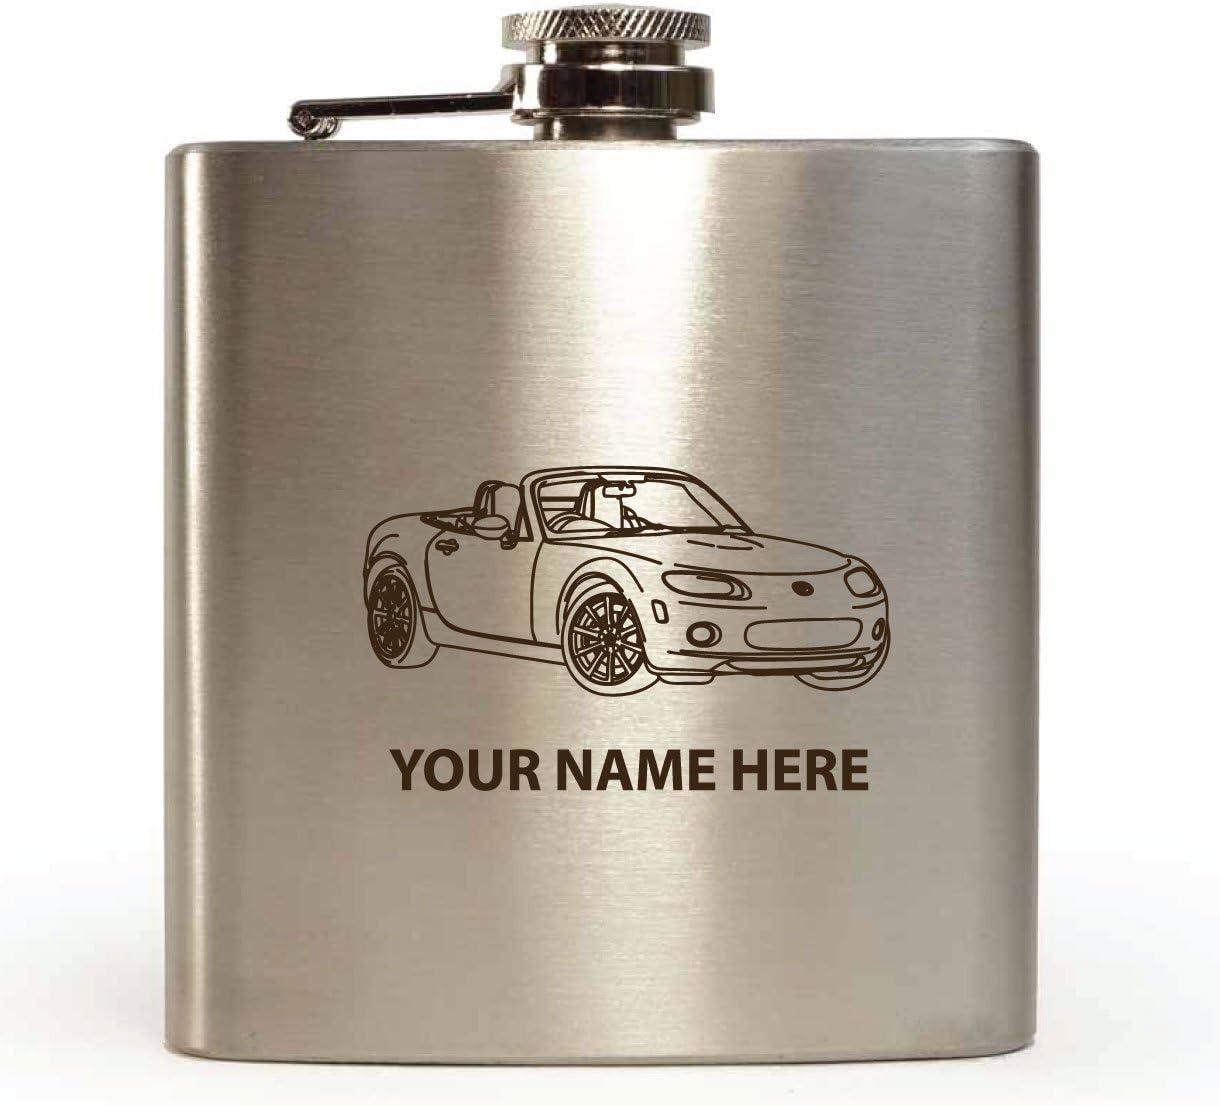 Mazda Mx5 Mk3 Design Personalised Hip Flask Funnel With Gift Box Amazon De Kuche Haushalt